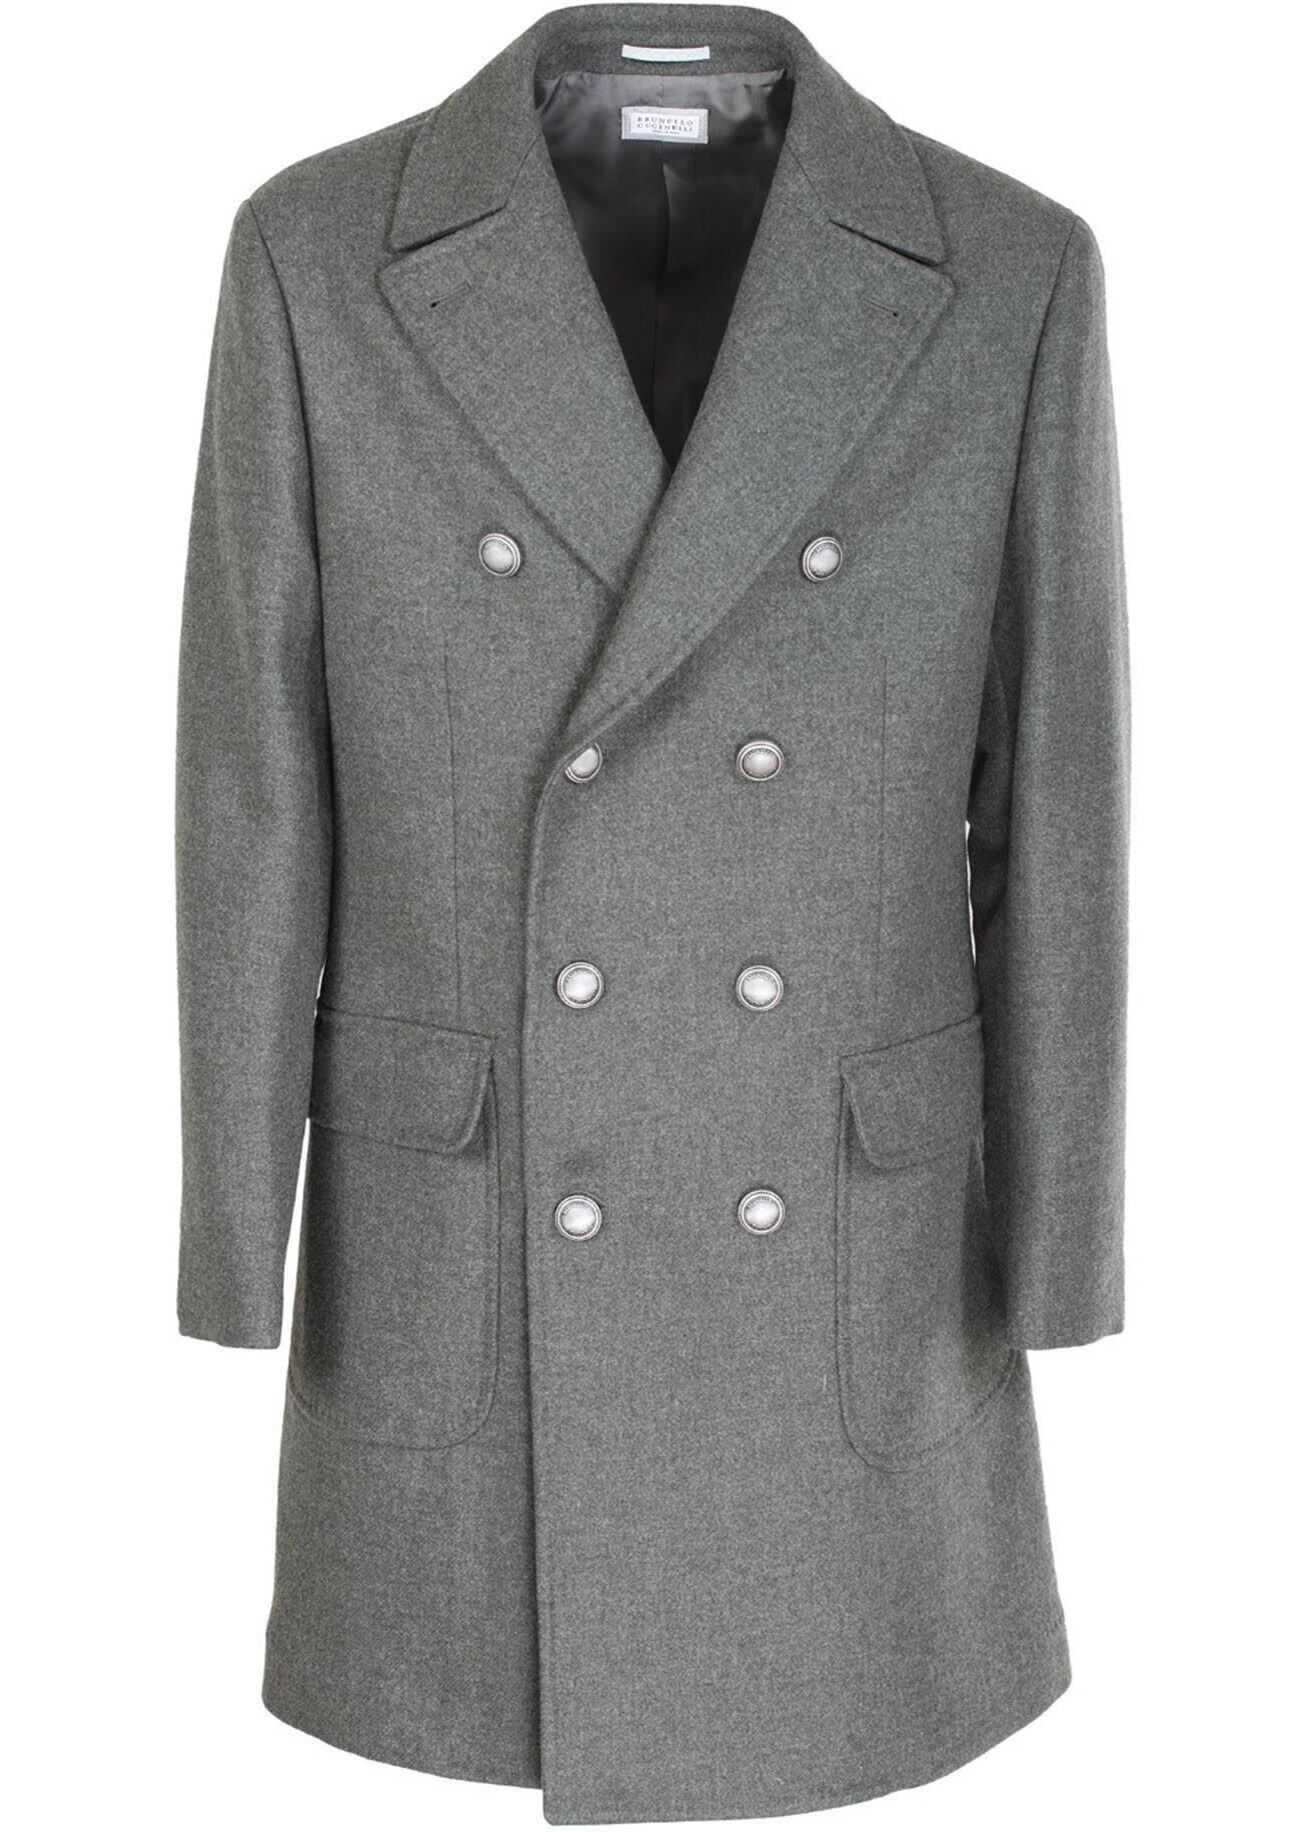 Brunello Cucinelli Double-Breasted Coat In Melange Grey Grey imagine